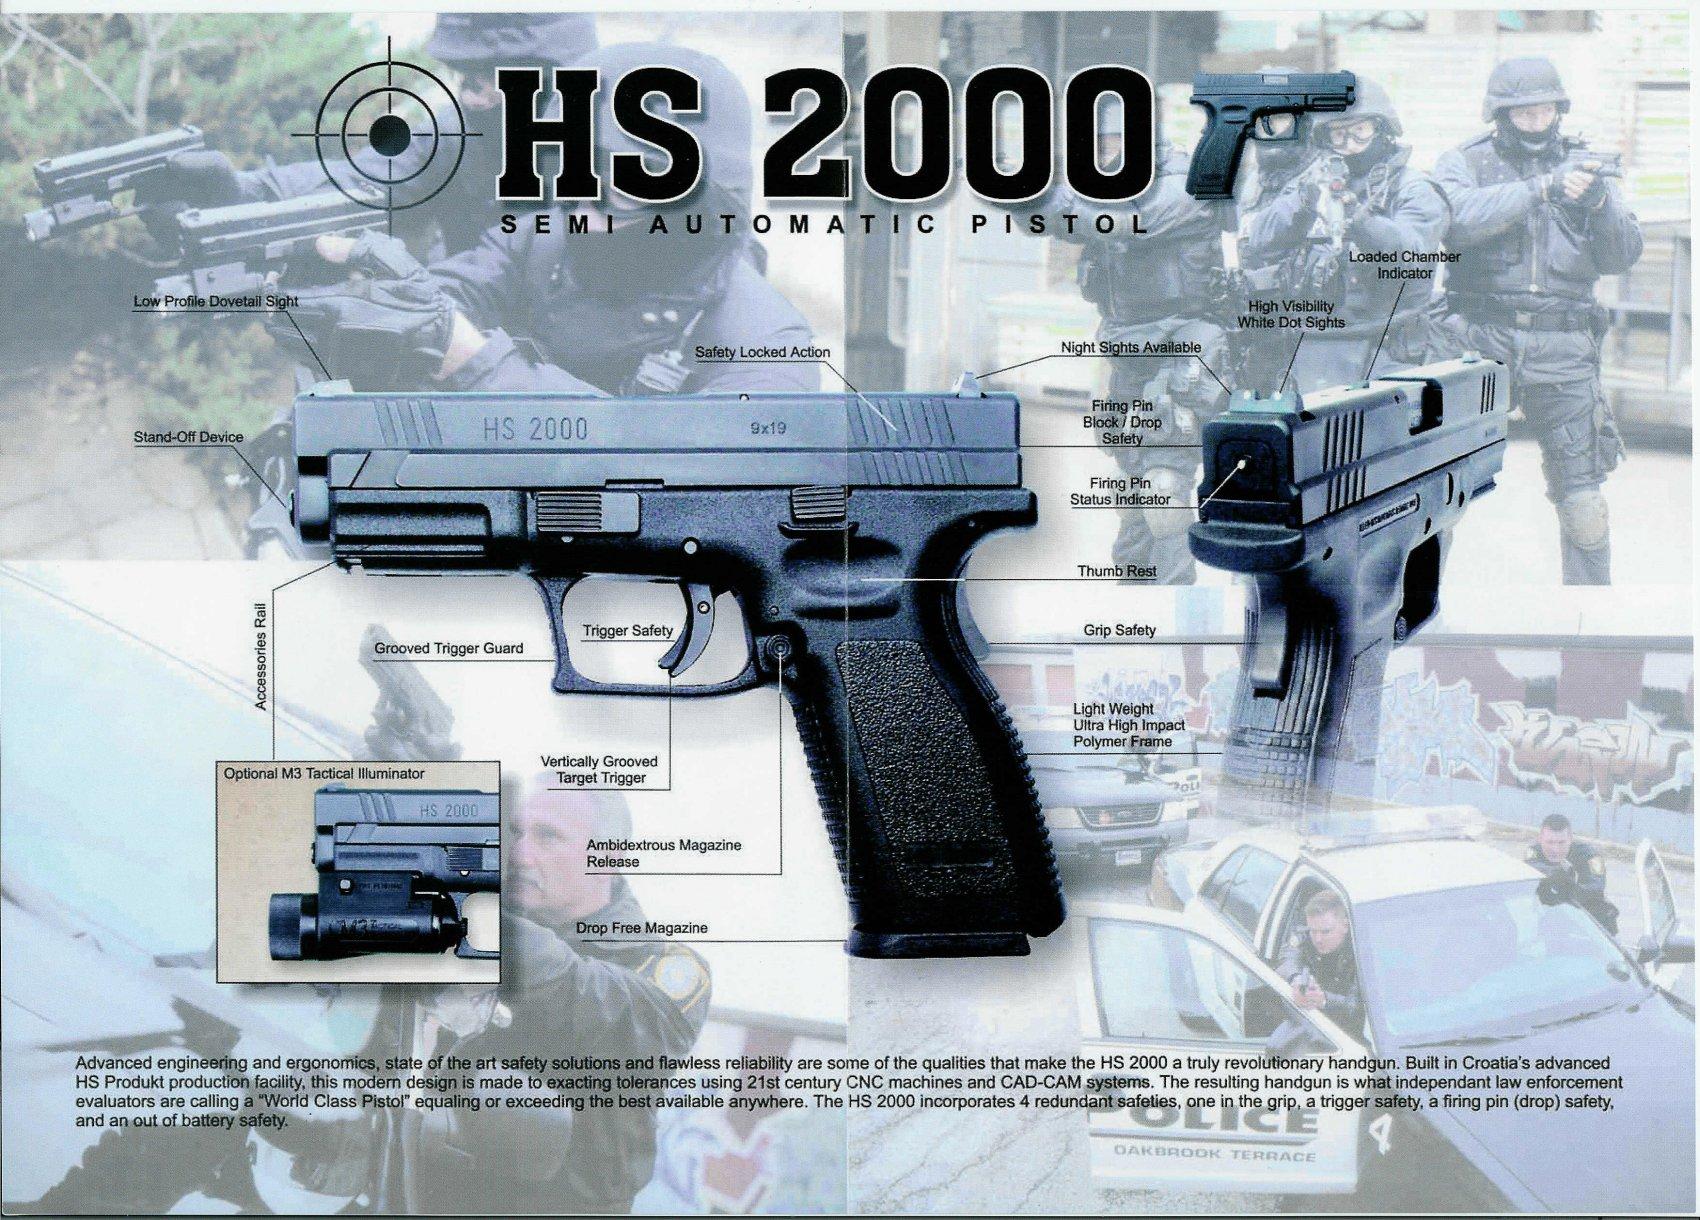 hs2000pampletinside1_1.jpg